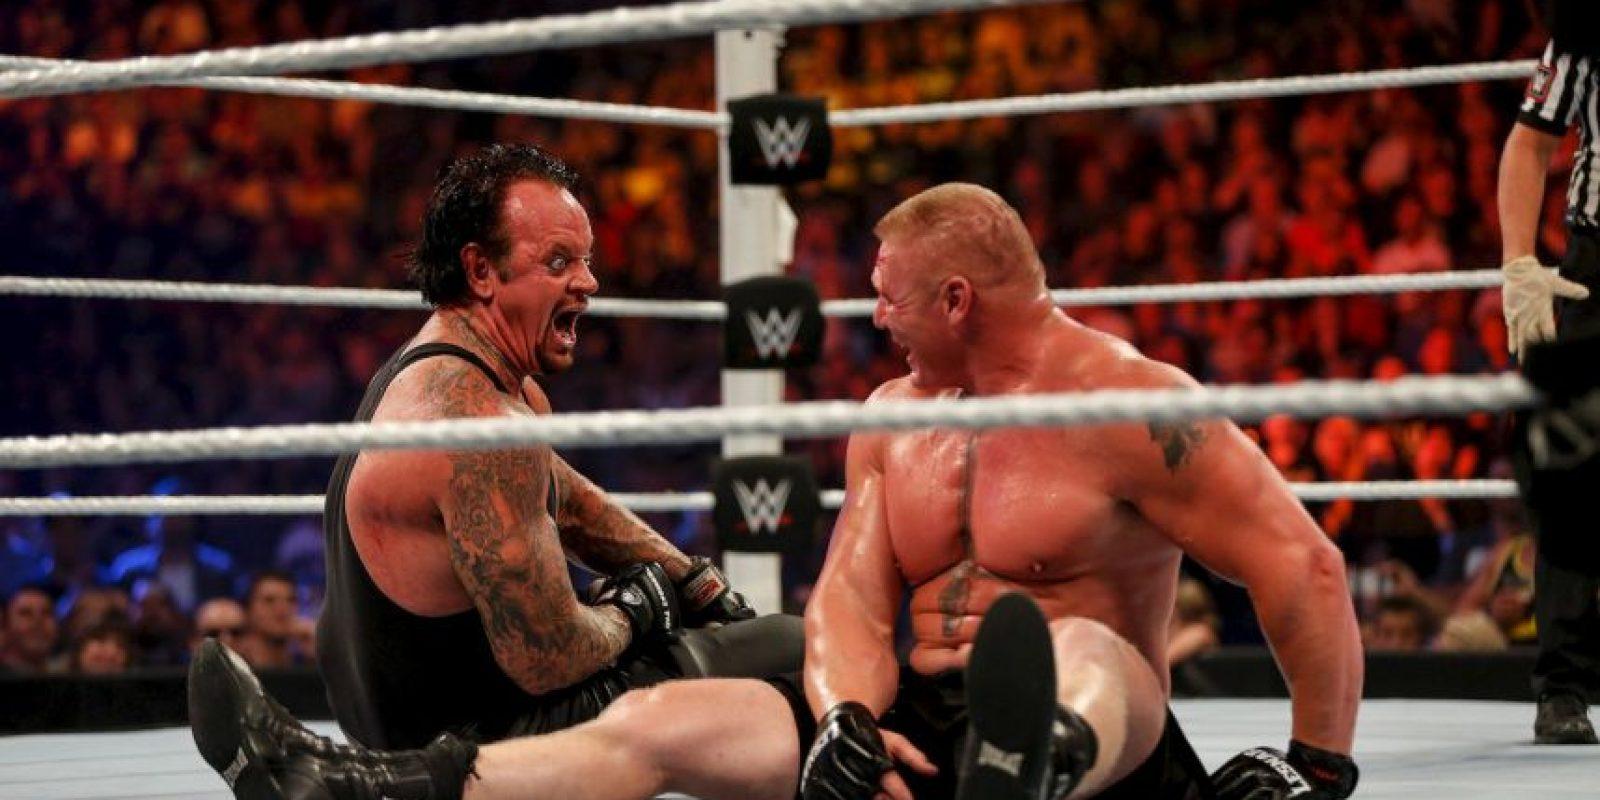 Los 10 mejores luchadores de WWE 2K17 Foto:Getty Images